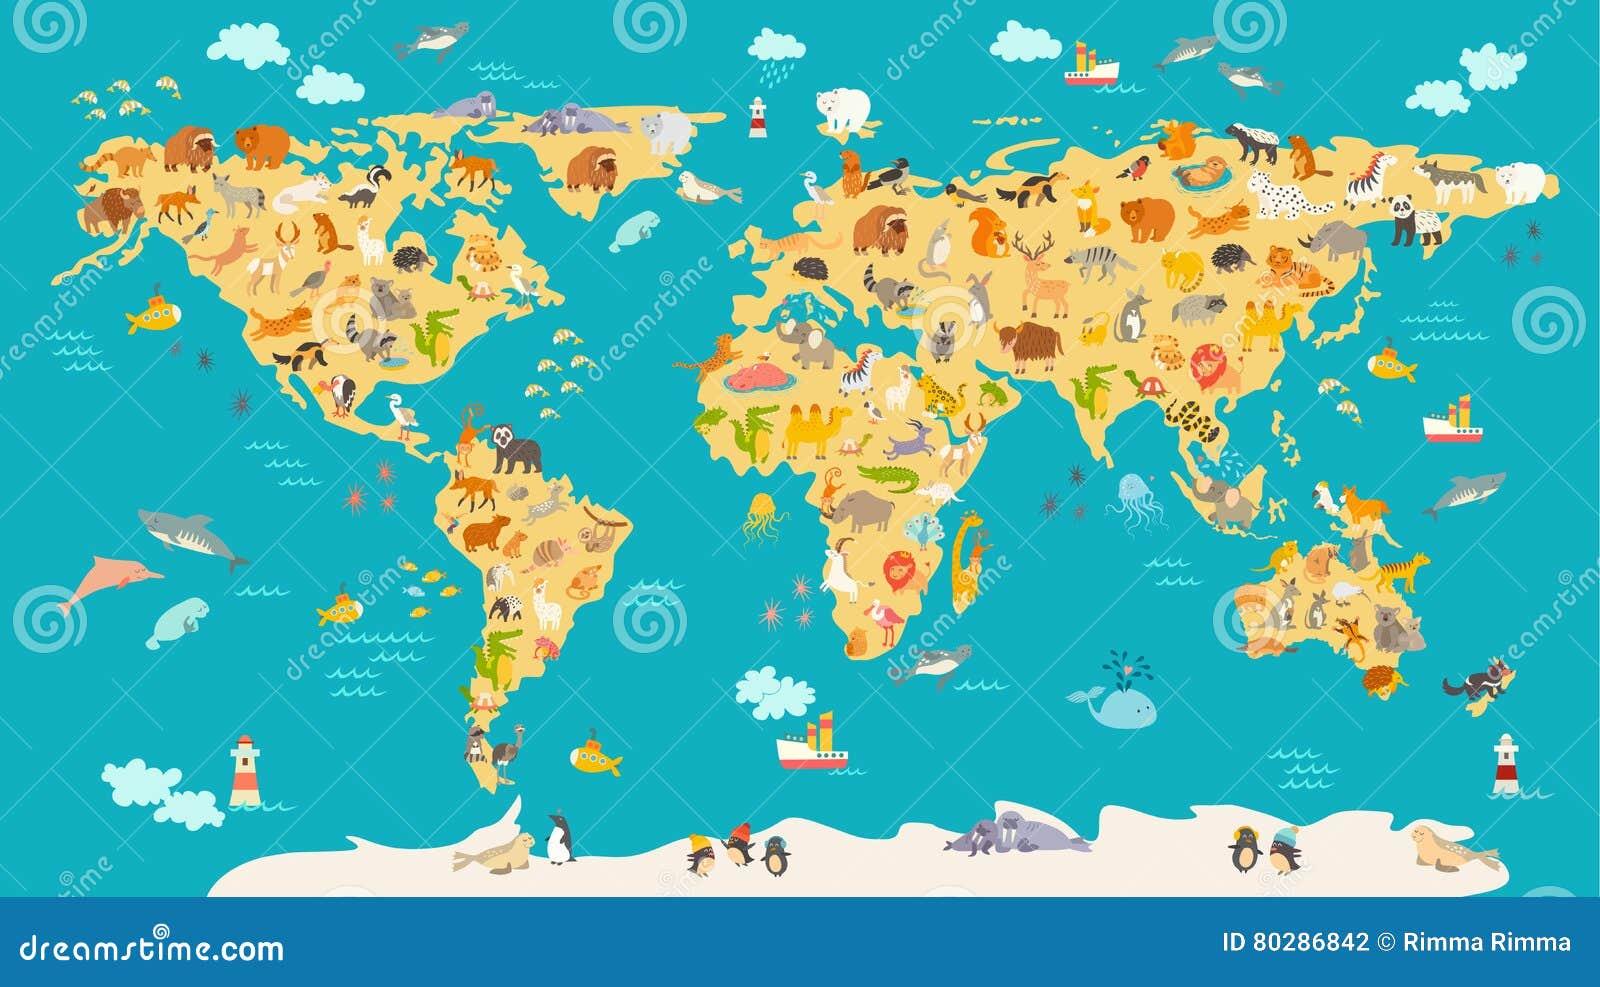 Animal Map For Kid World Vector Poster For Children Cute